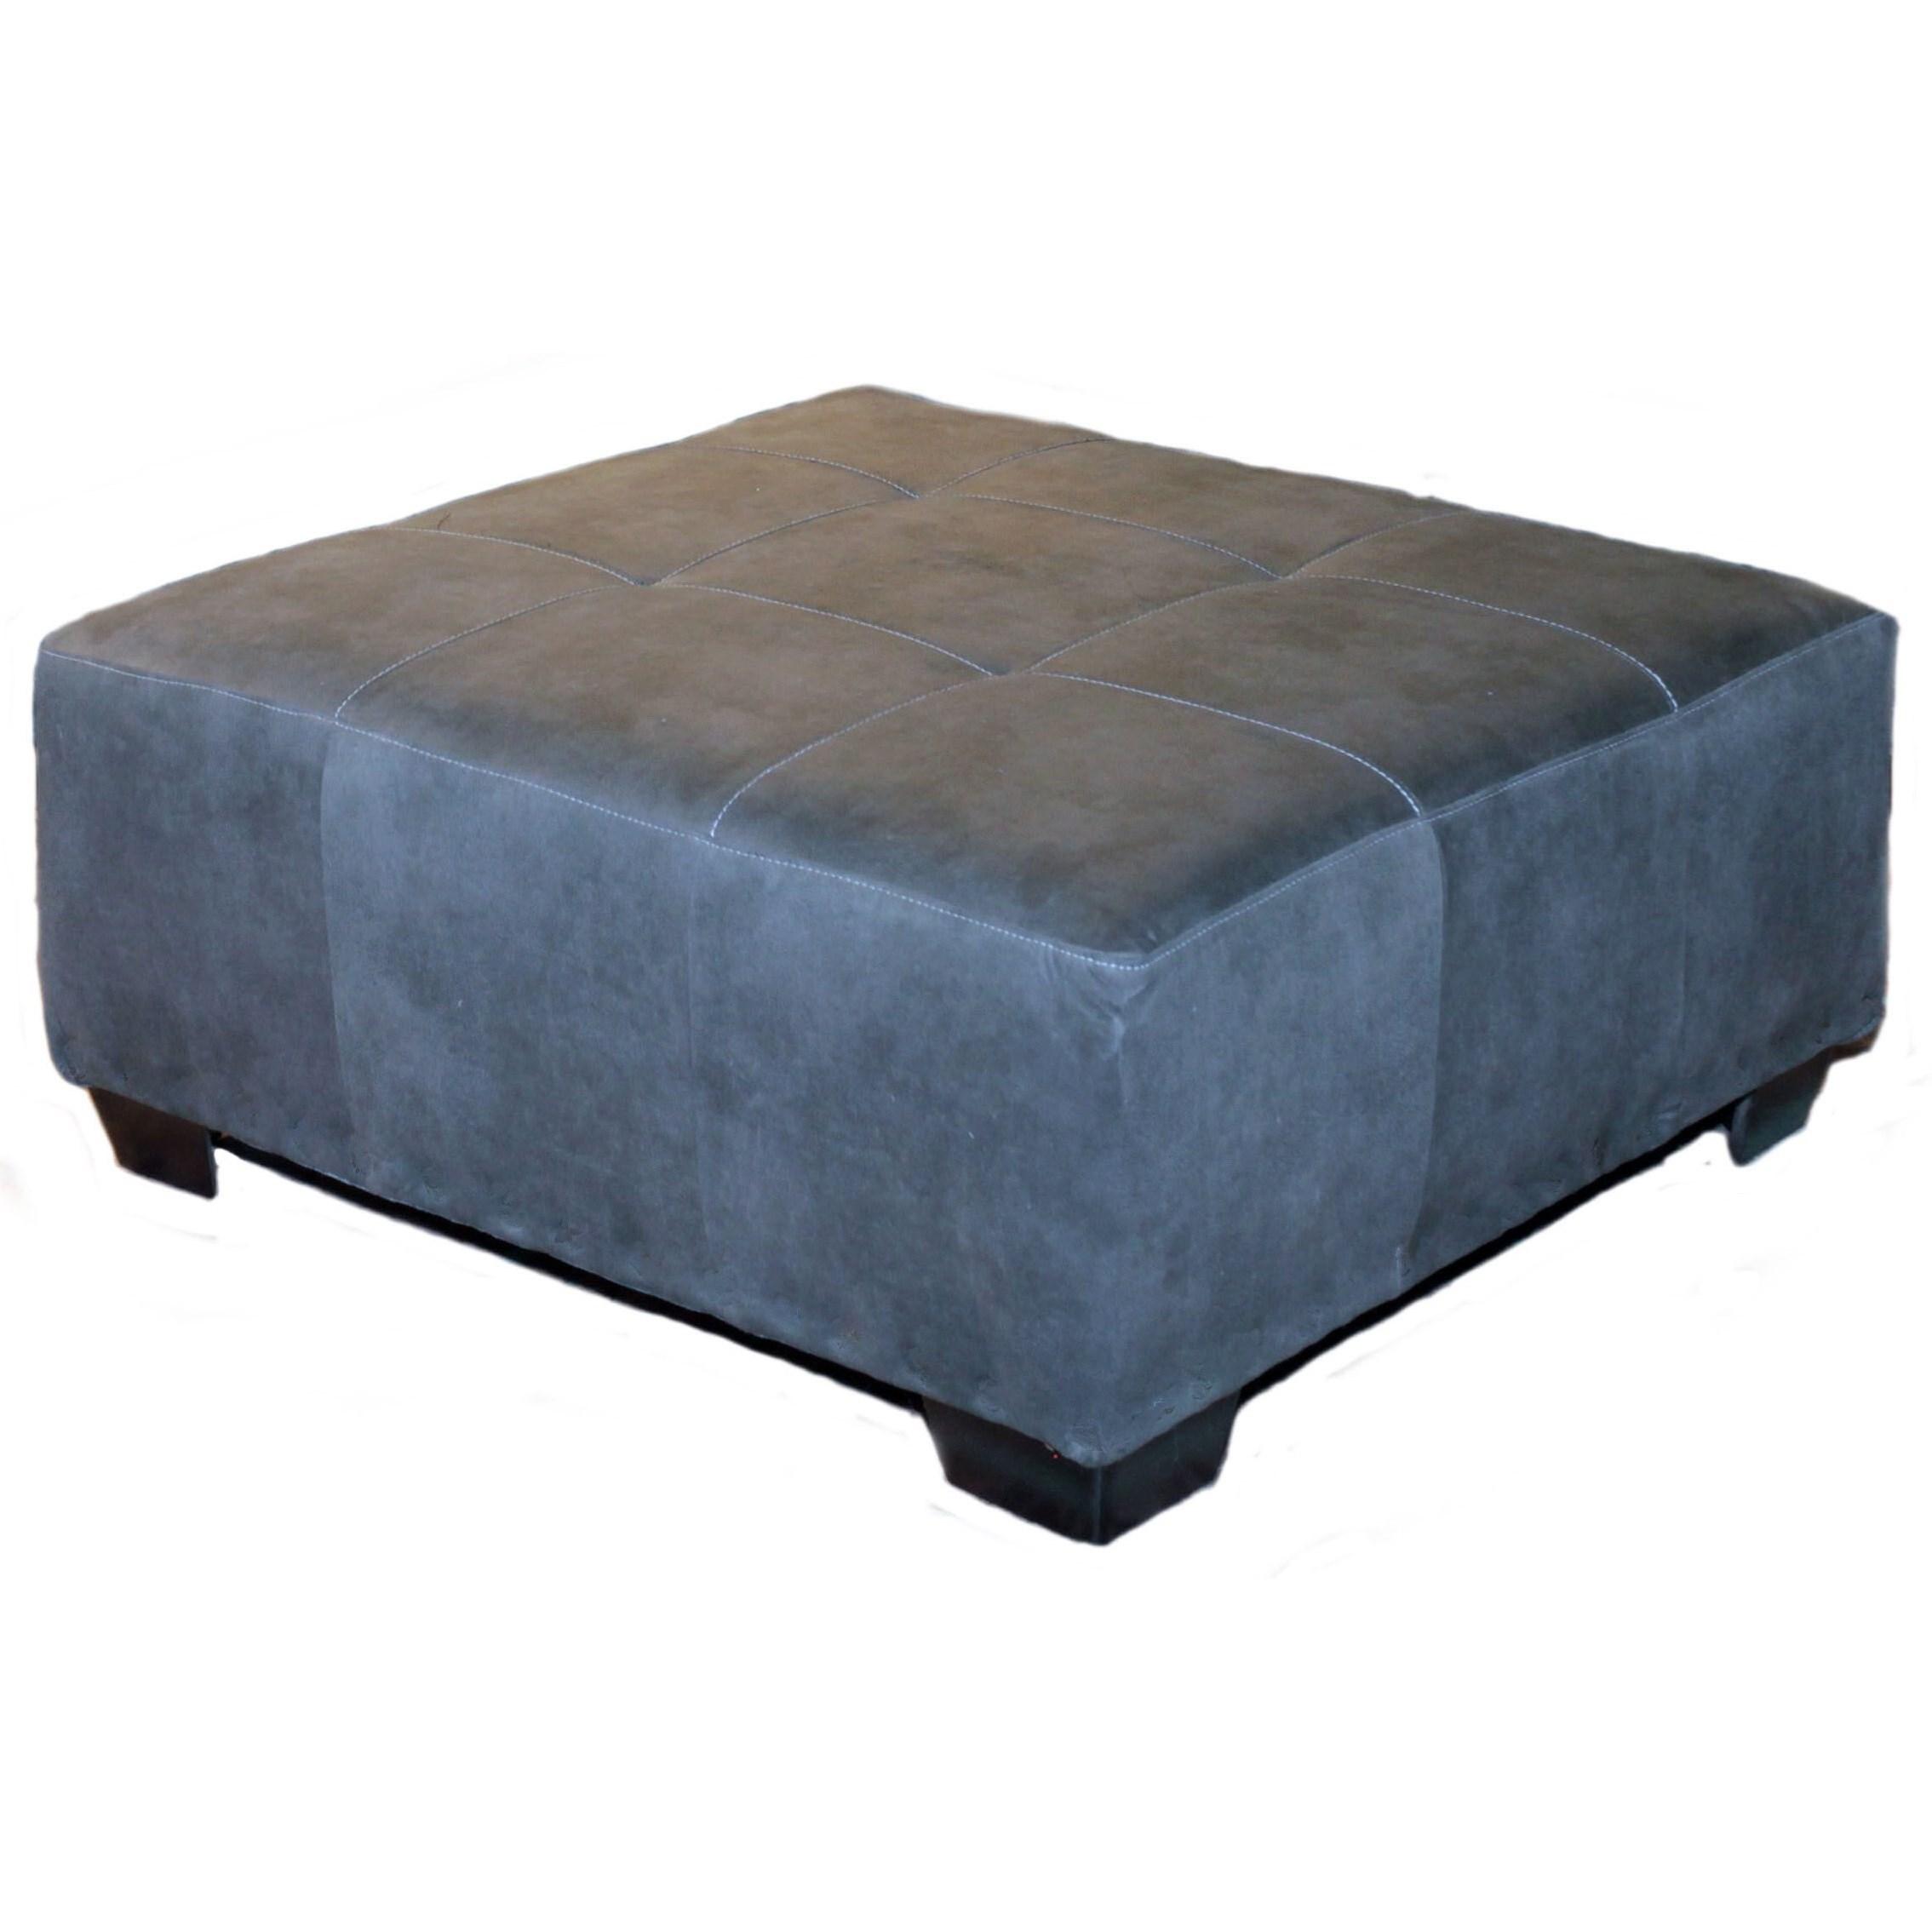 Seminole Furniture 3250 Ottoman - Item Number: 3251-600